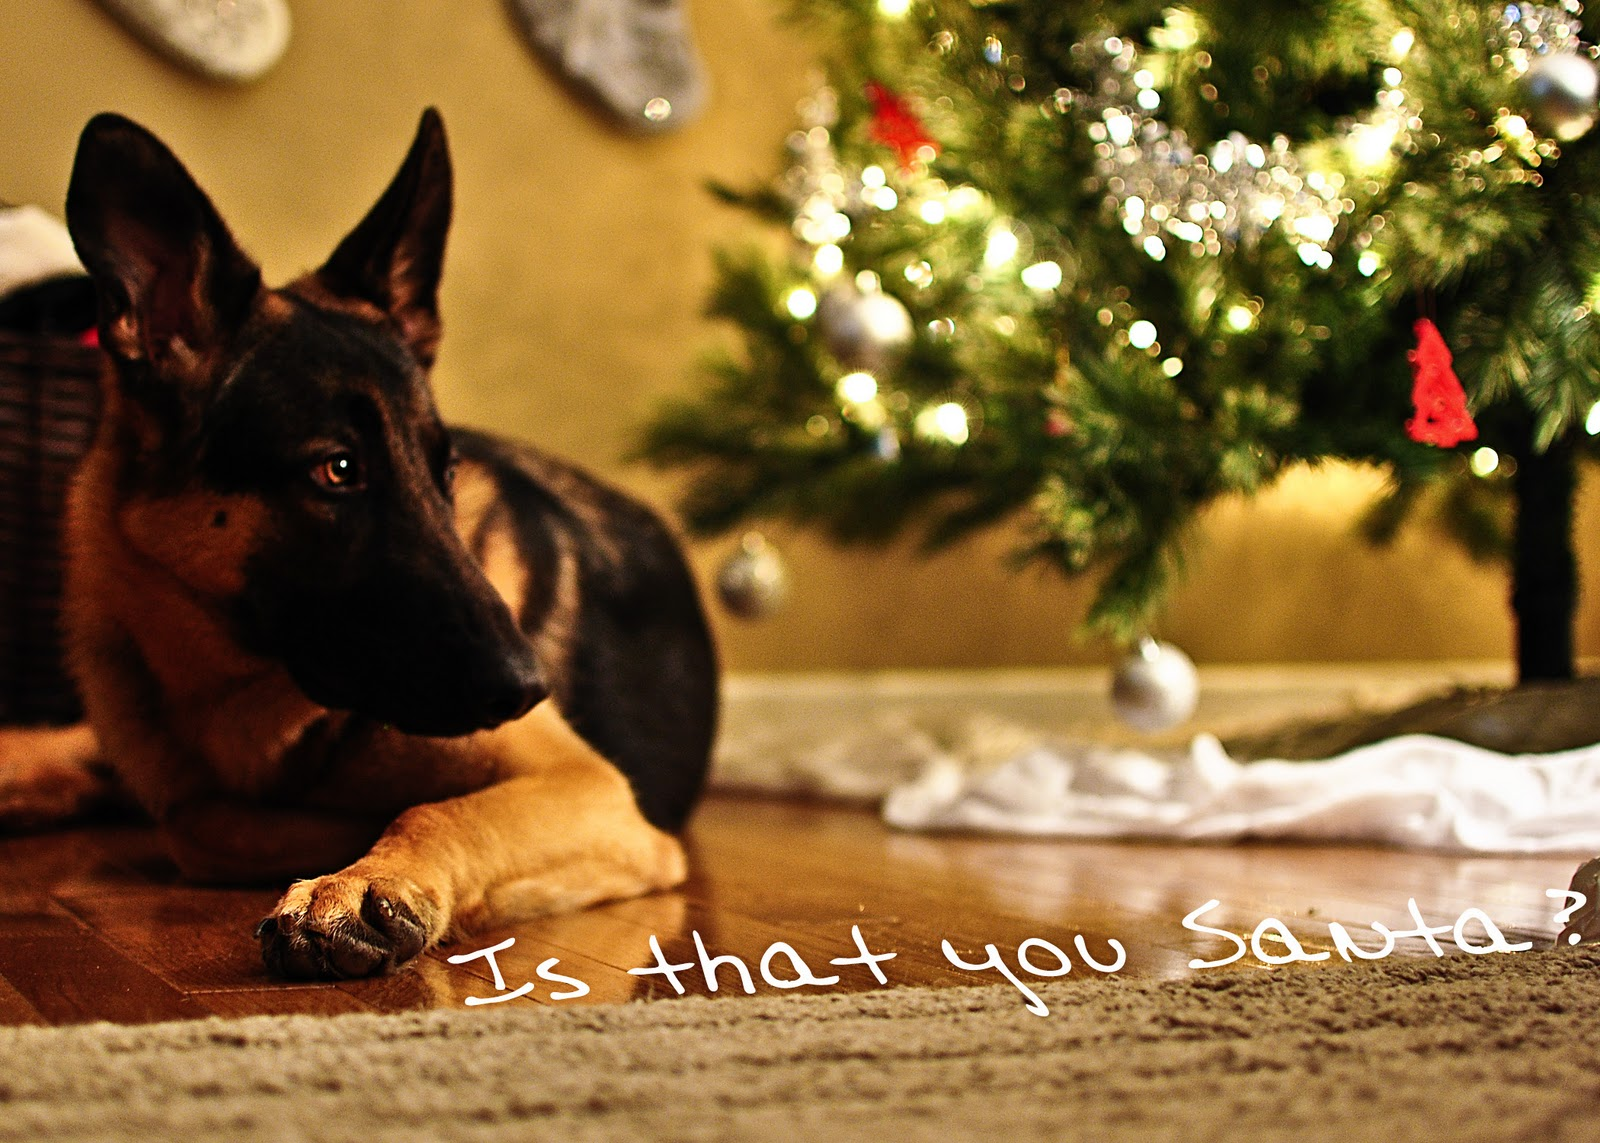 Dog Home Alone Chew And Lift Leg